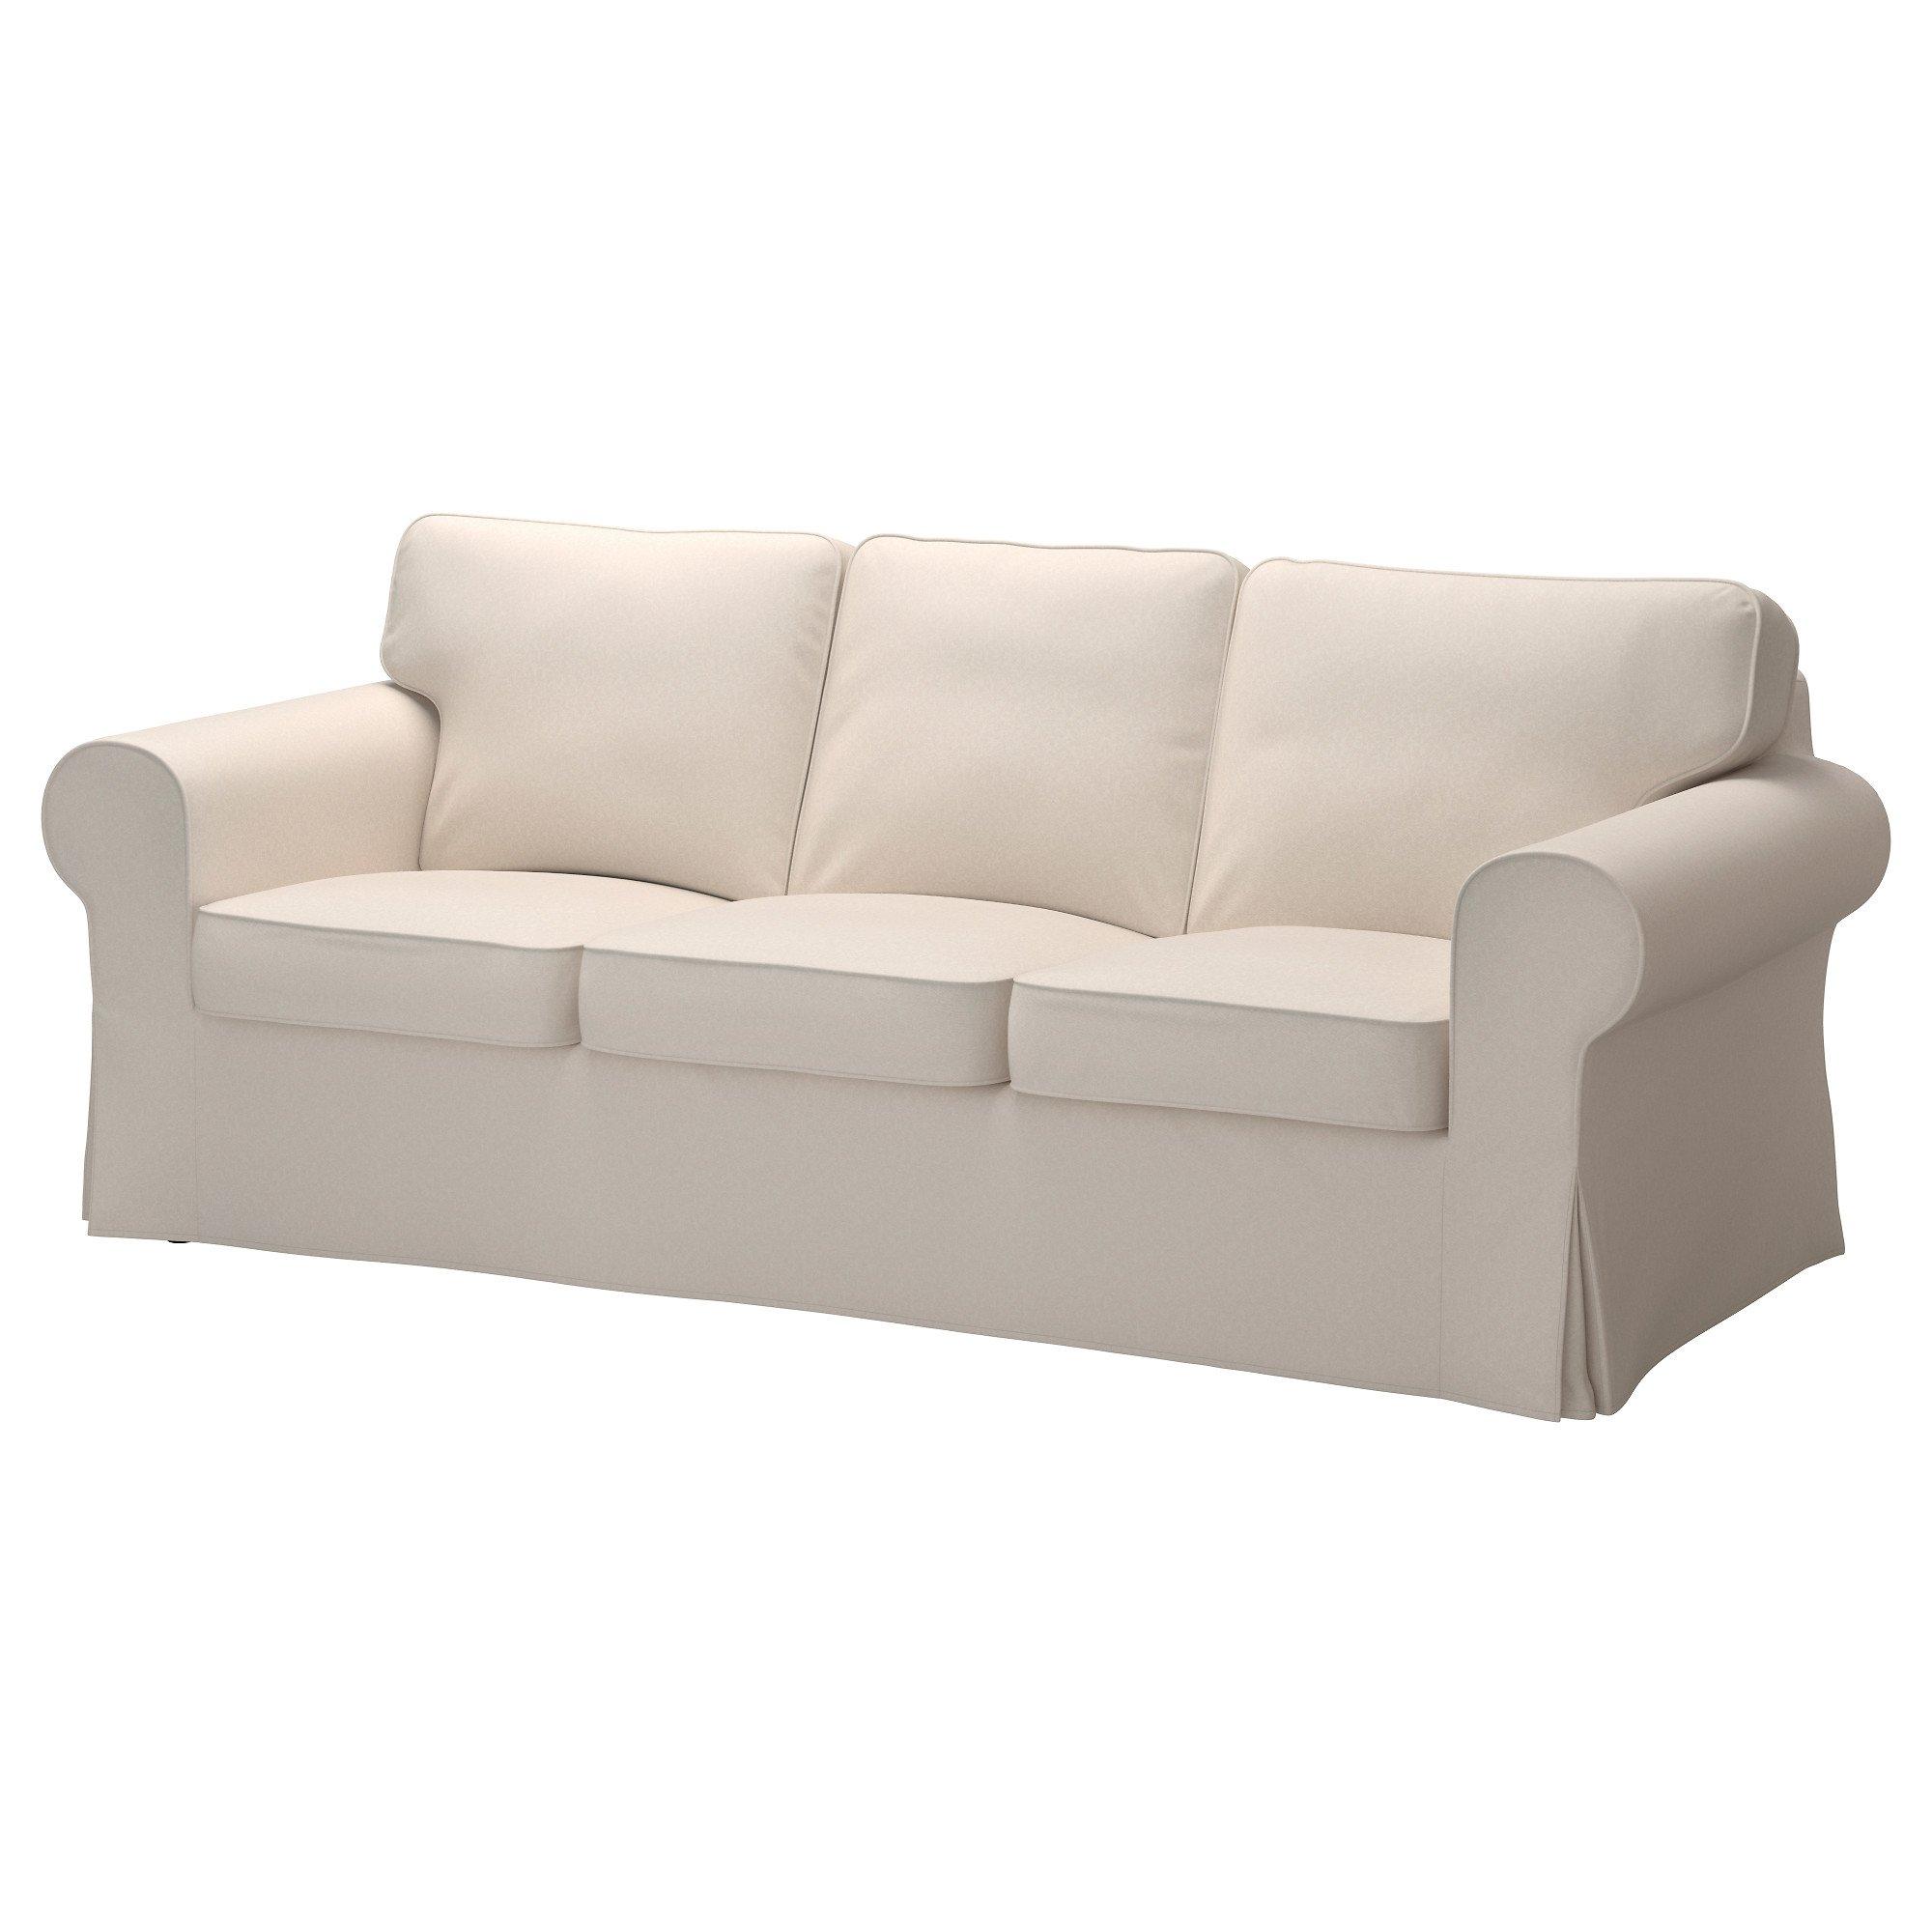 Pleasant Cheap Ikea Beddinge Sofa Cover Find Ikea Beddinge Sofa Short Links Chair Design For Home Short Linksinfo